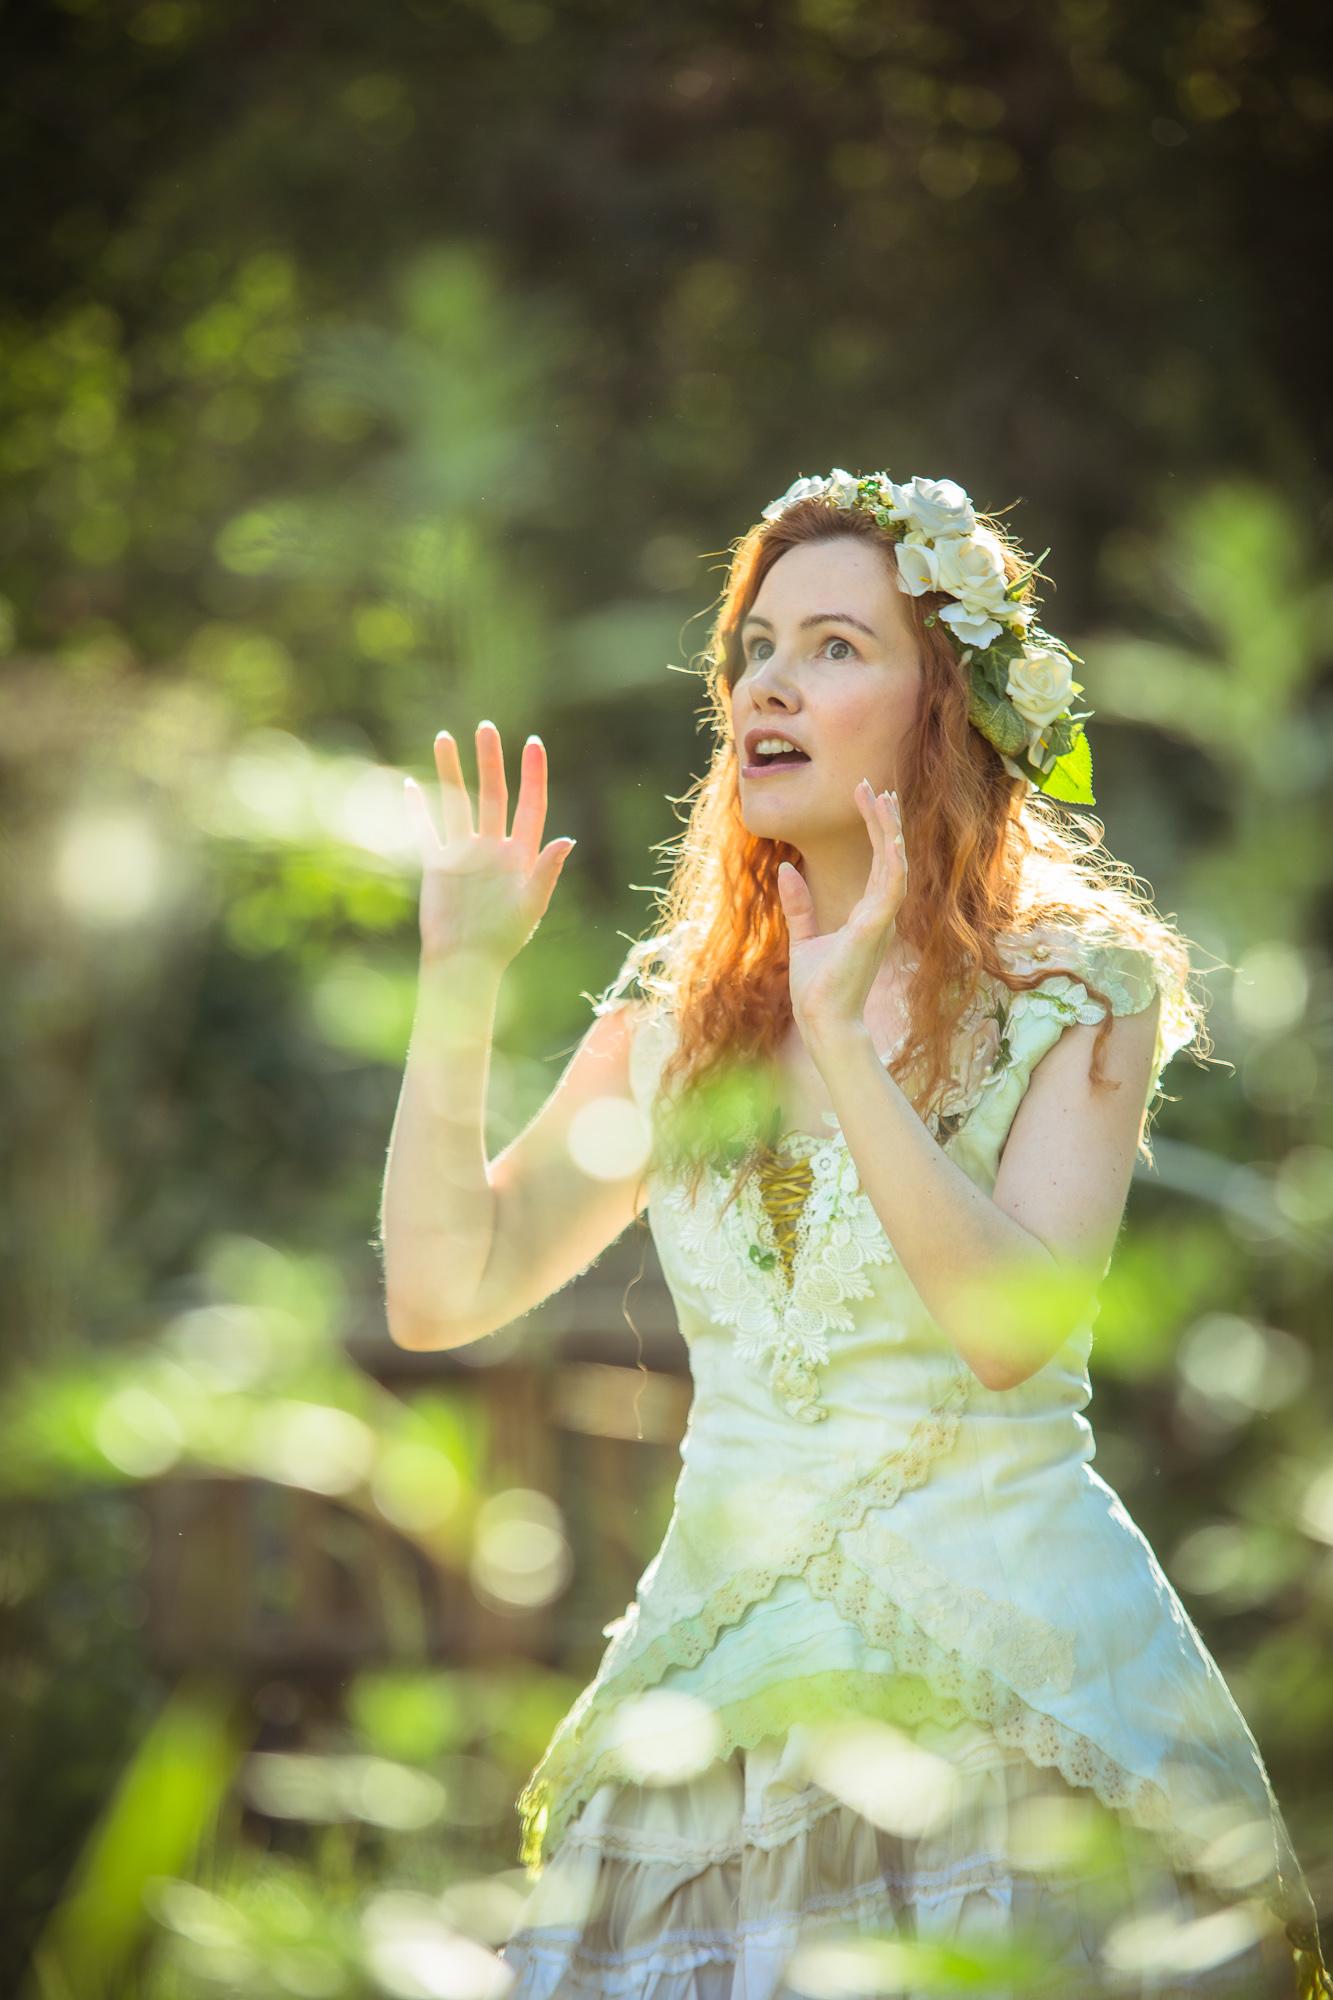 Promoshooting | Kostüm und Blumenkranz | Rumpelmärchen | Petra Feilen